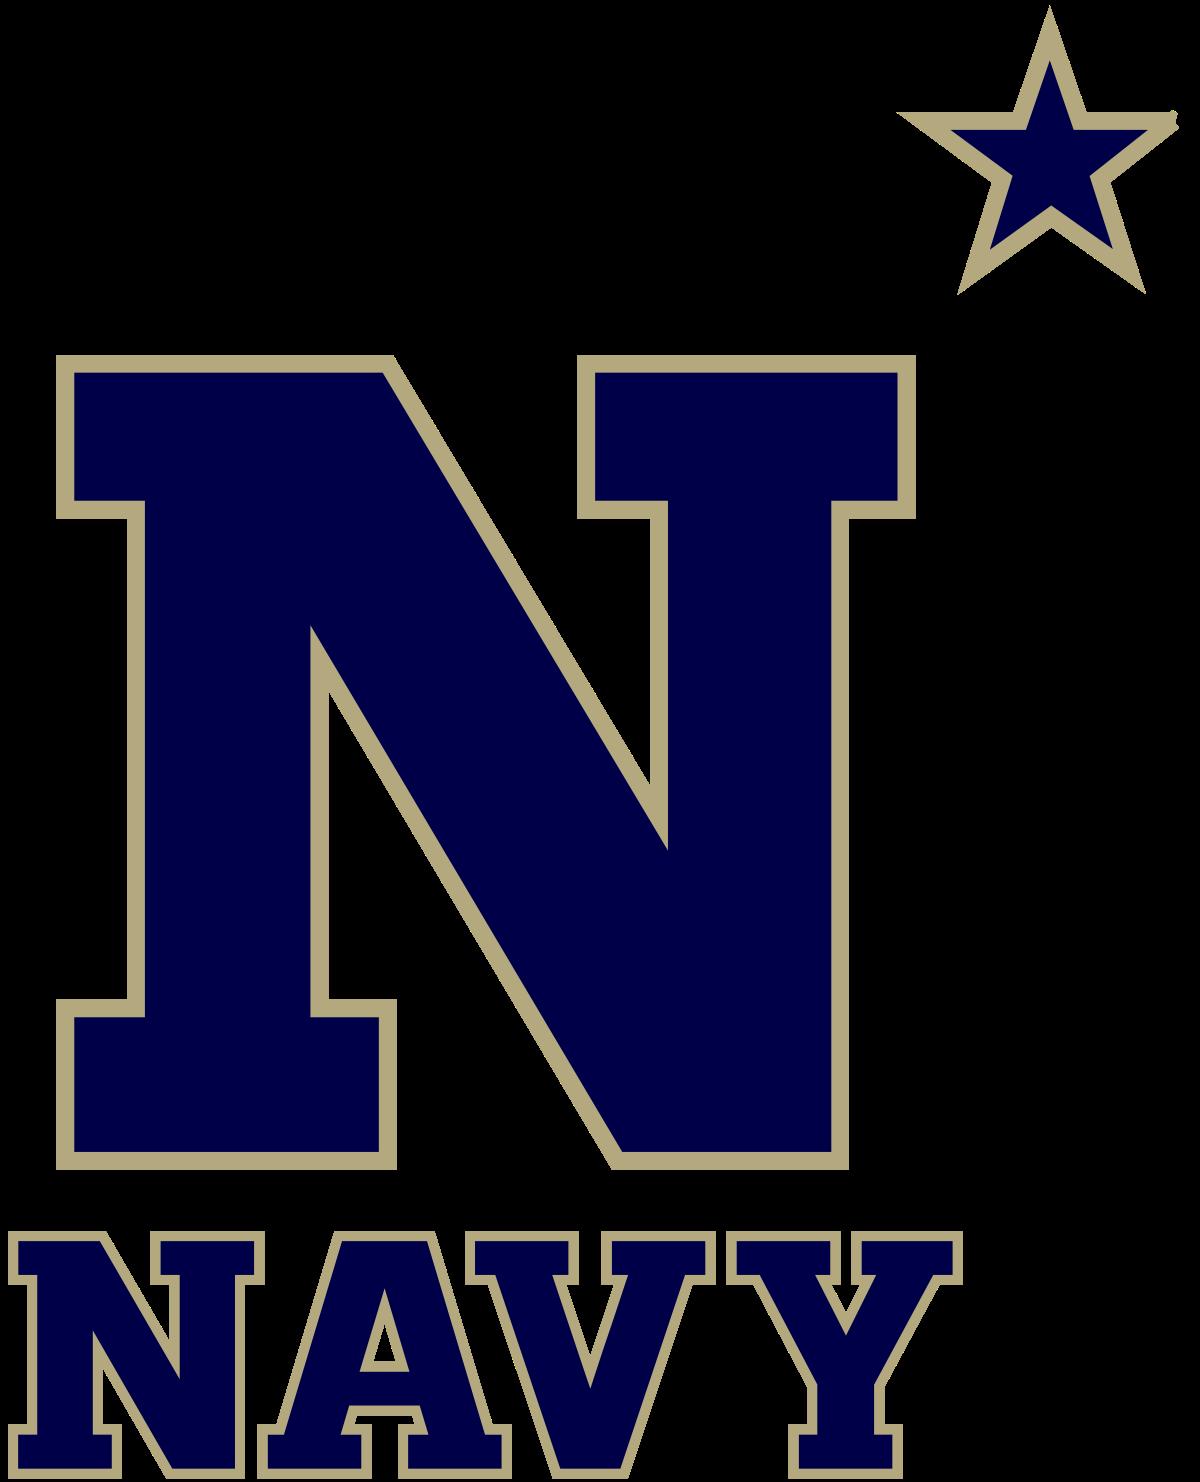 Navy Football Logo Transparent